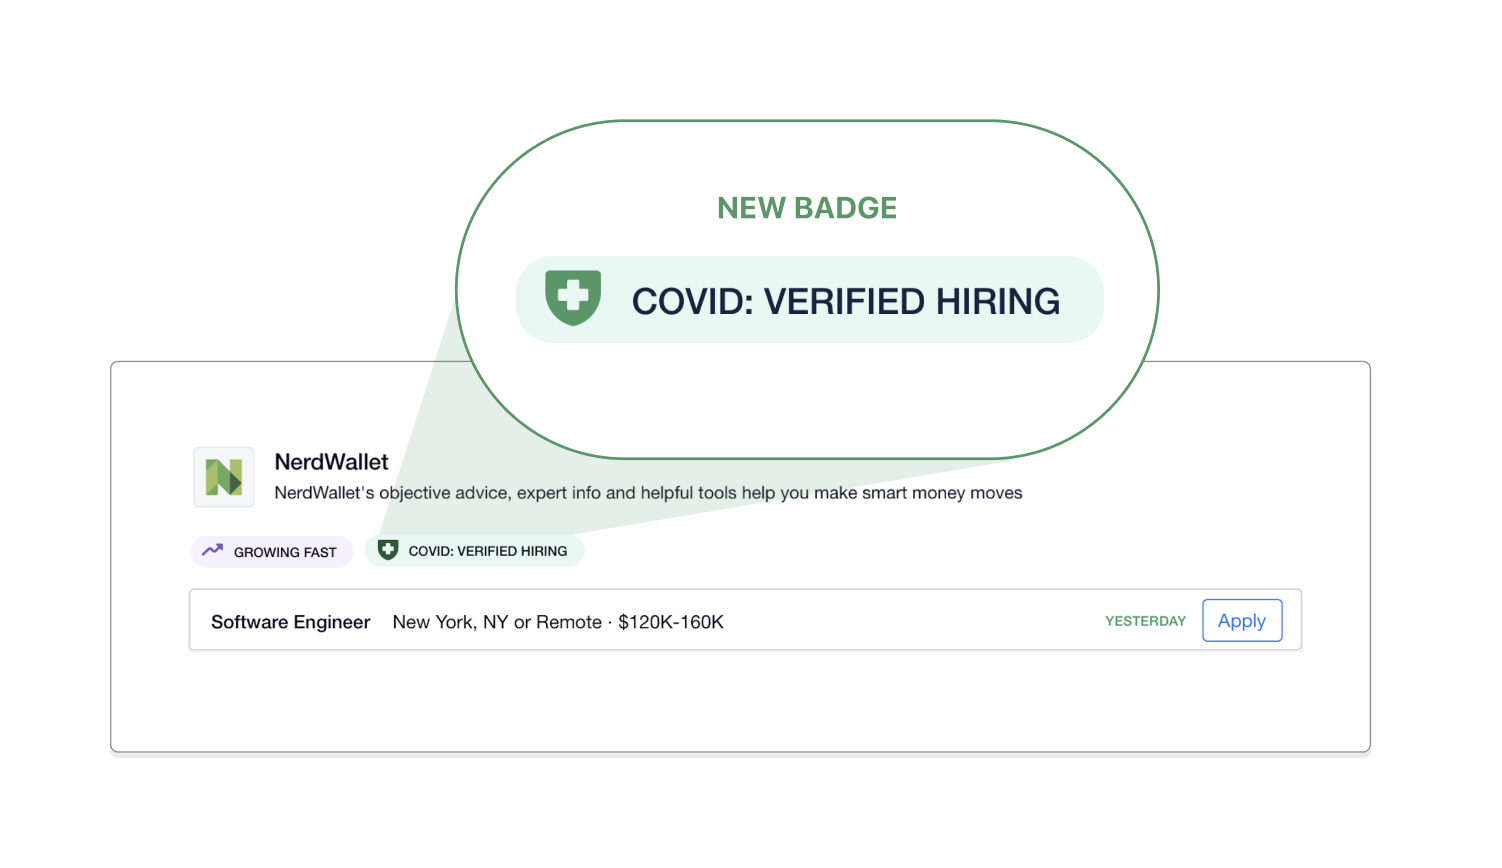 COVID: Verified Hiring badge